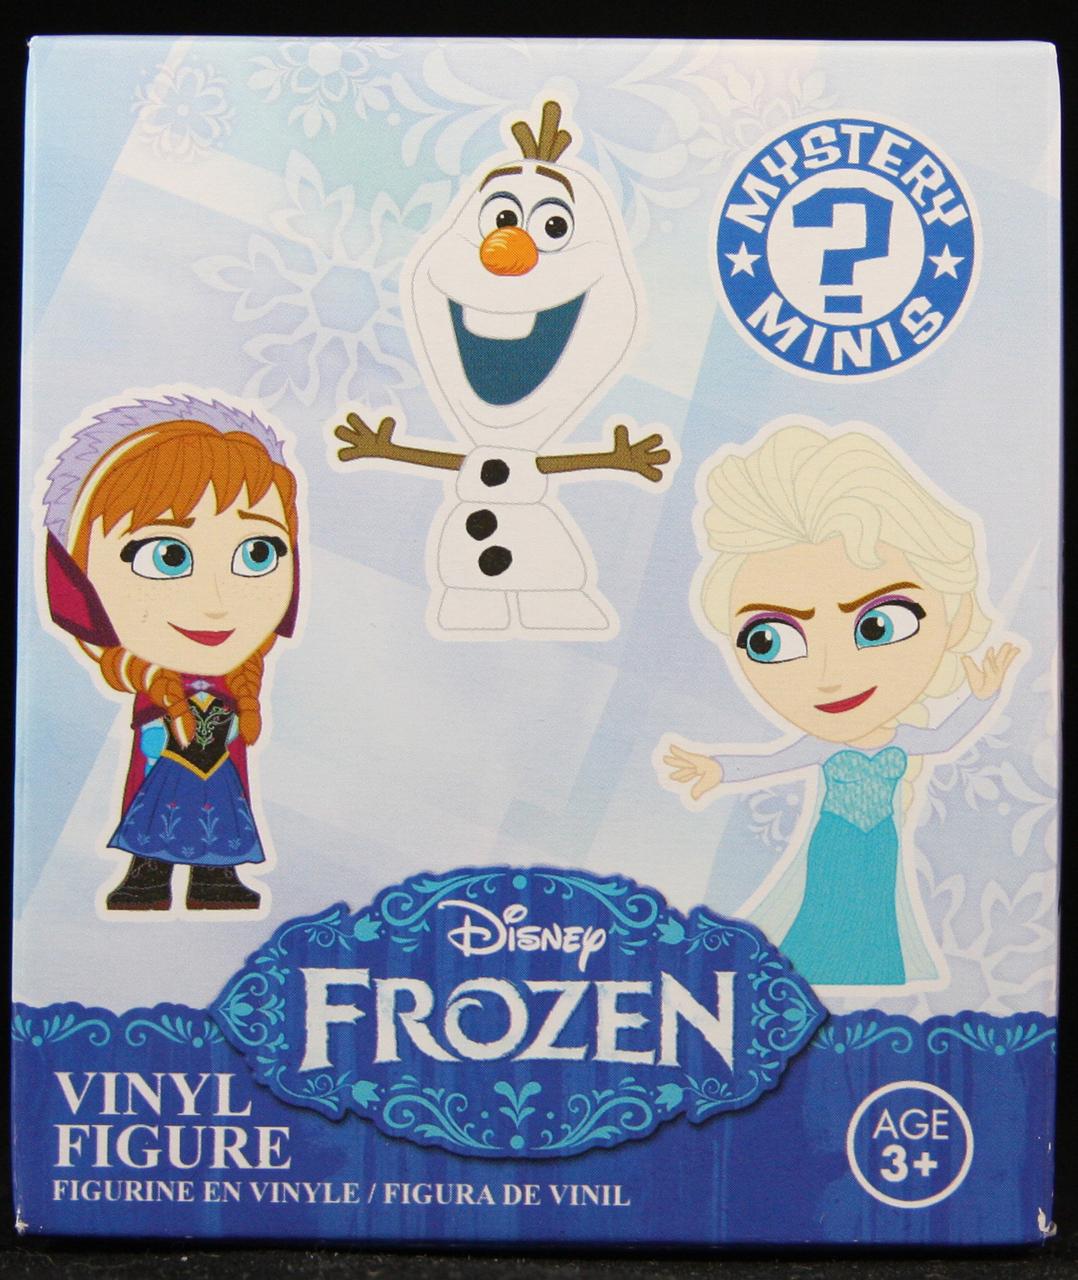 Disney Frozen Funko Mystery Minis Vinyl Figures 1 Blind Box